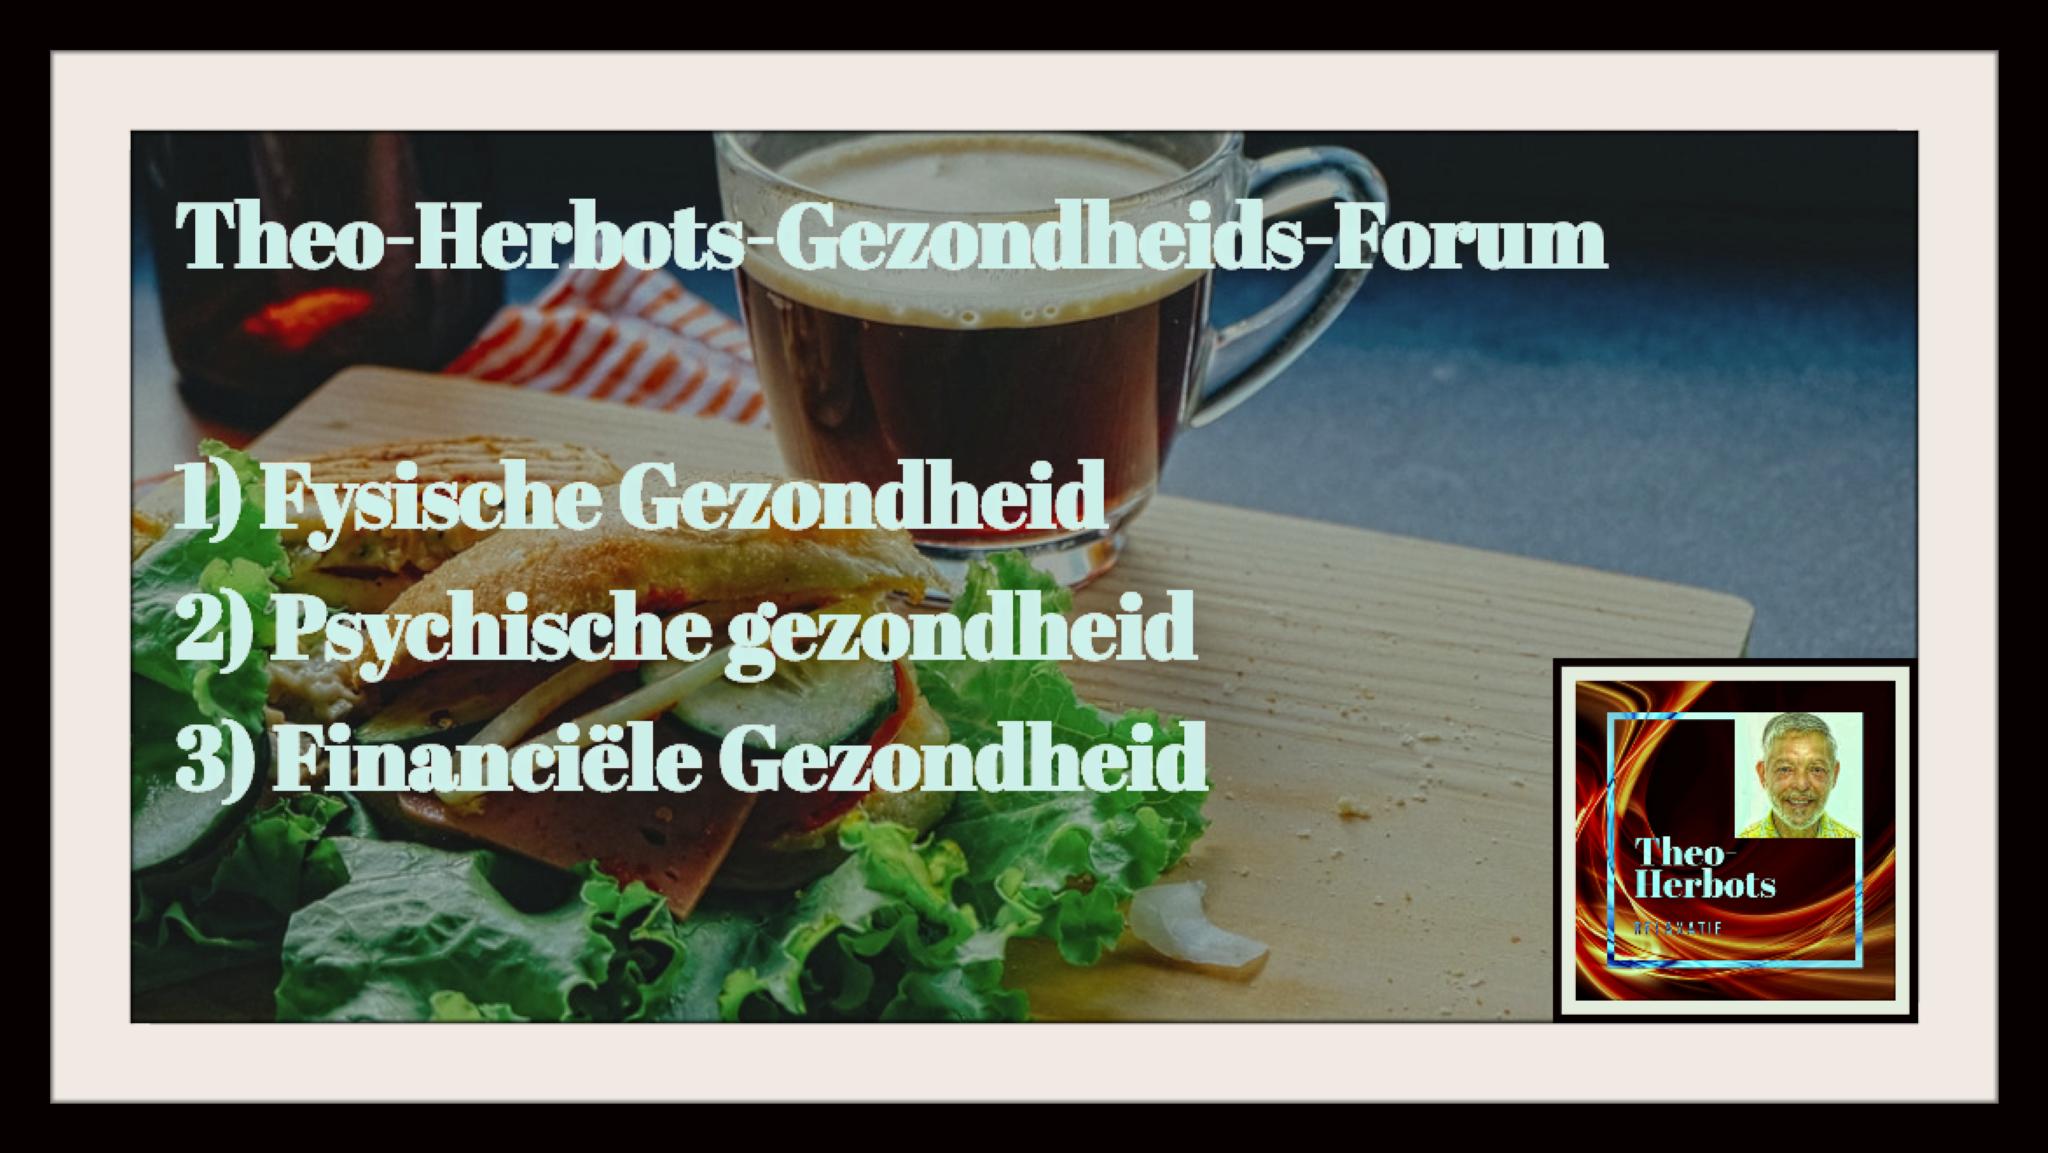 Theo-Herbots-Vip-Club